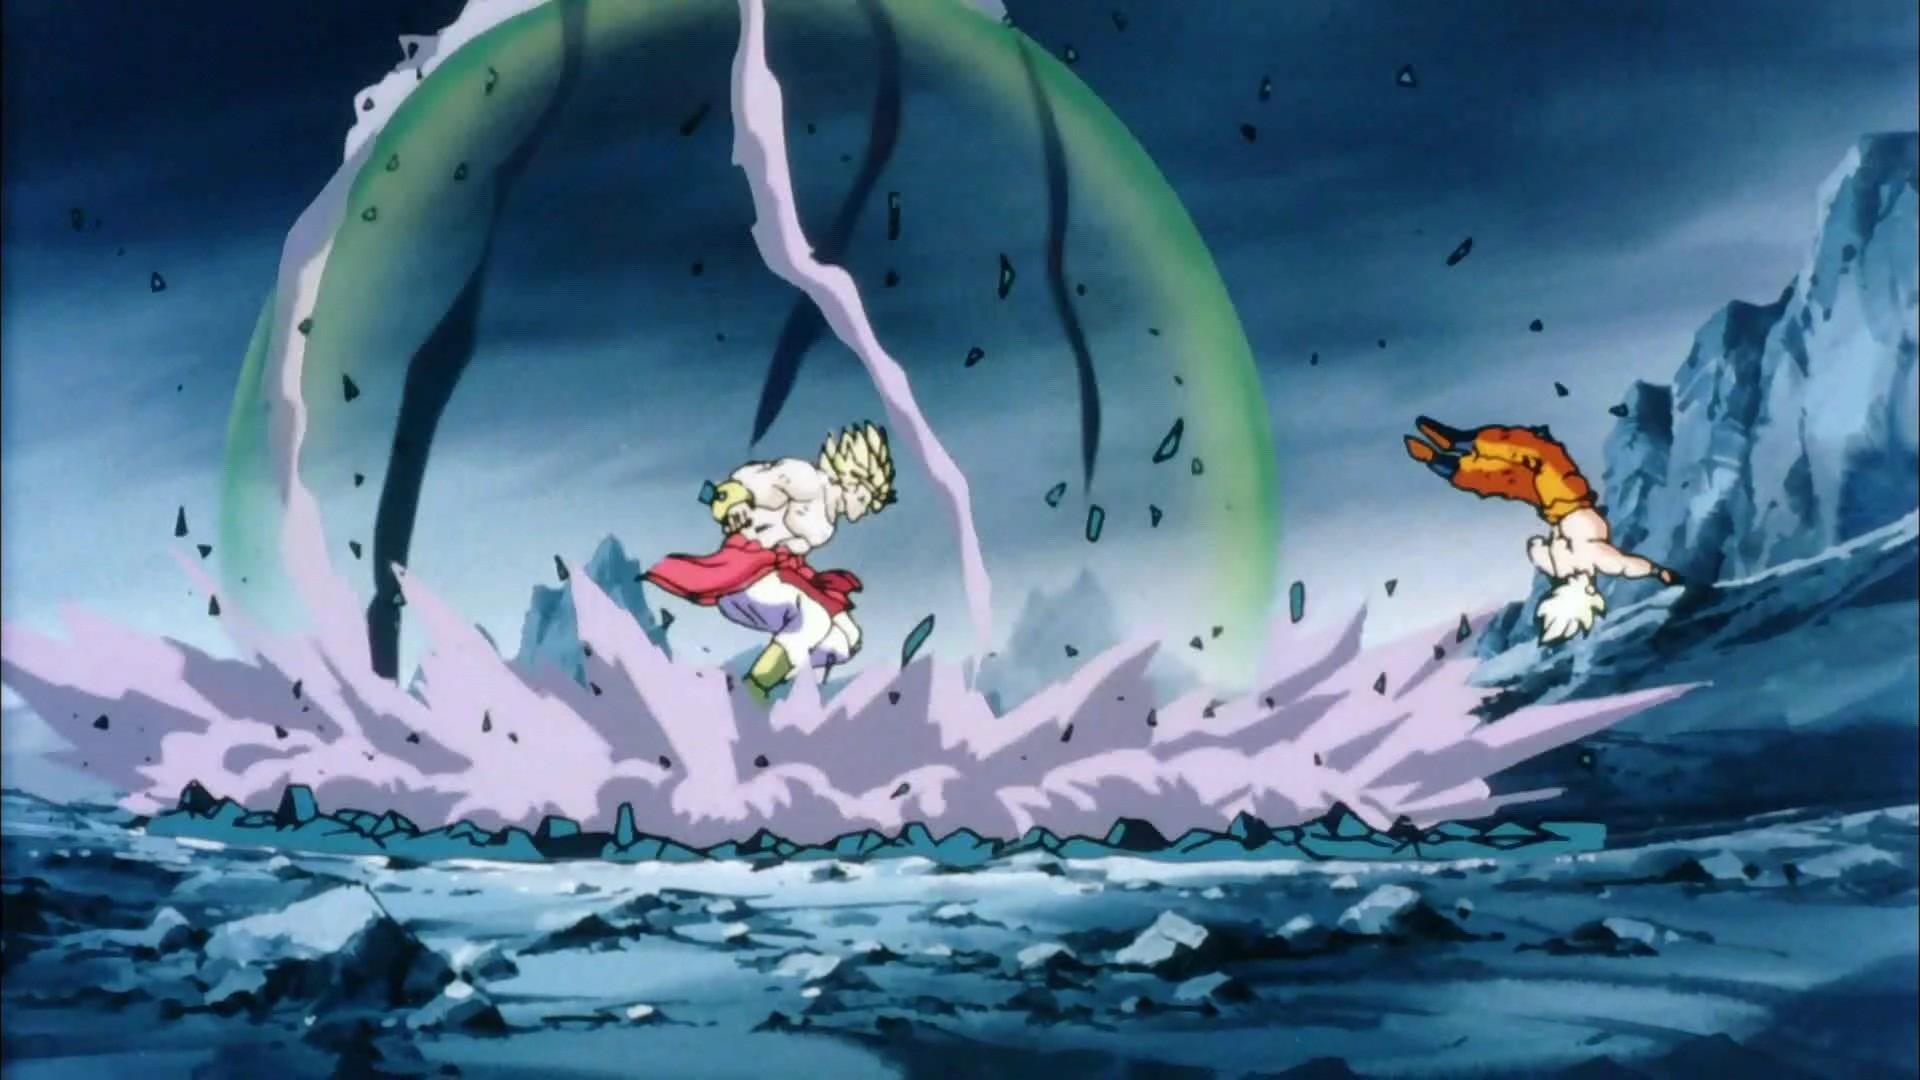 Supreme Wallpaper Hd Iphone X Goku Vs Broly Wallpaper 61 Images